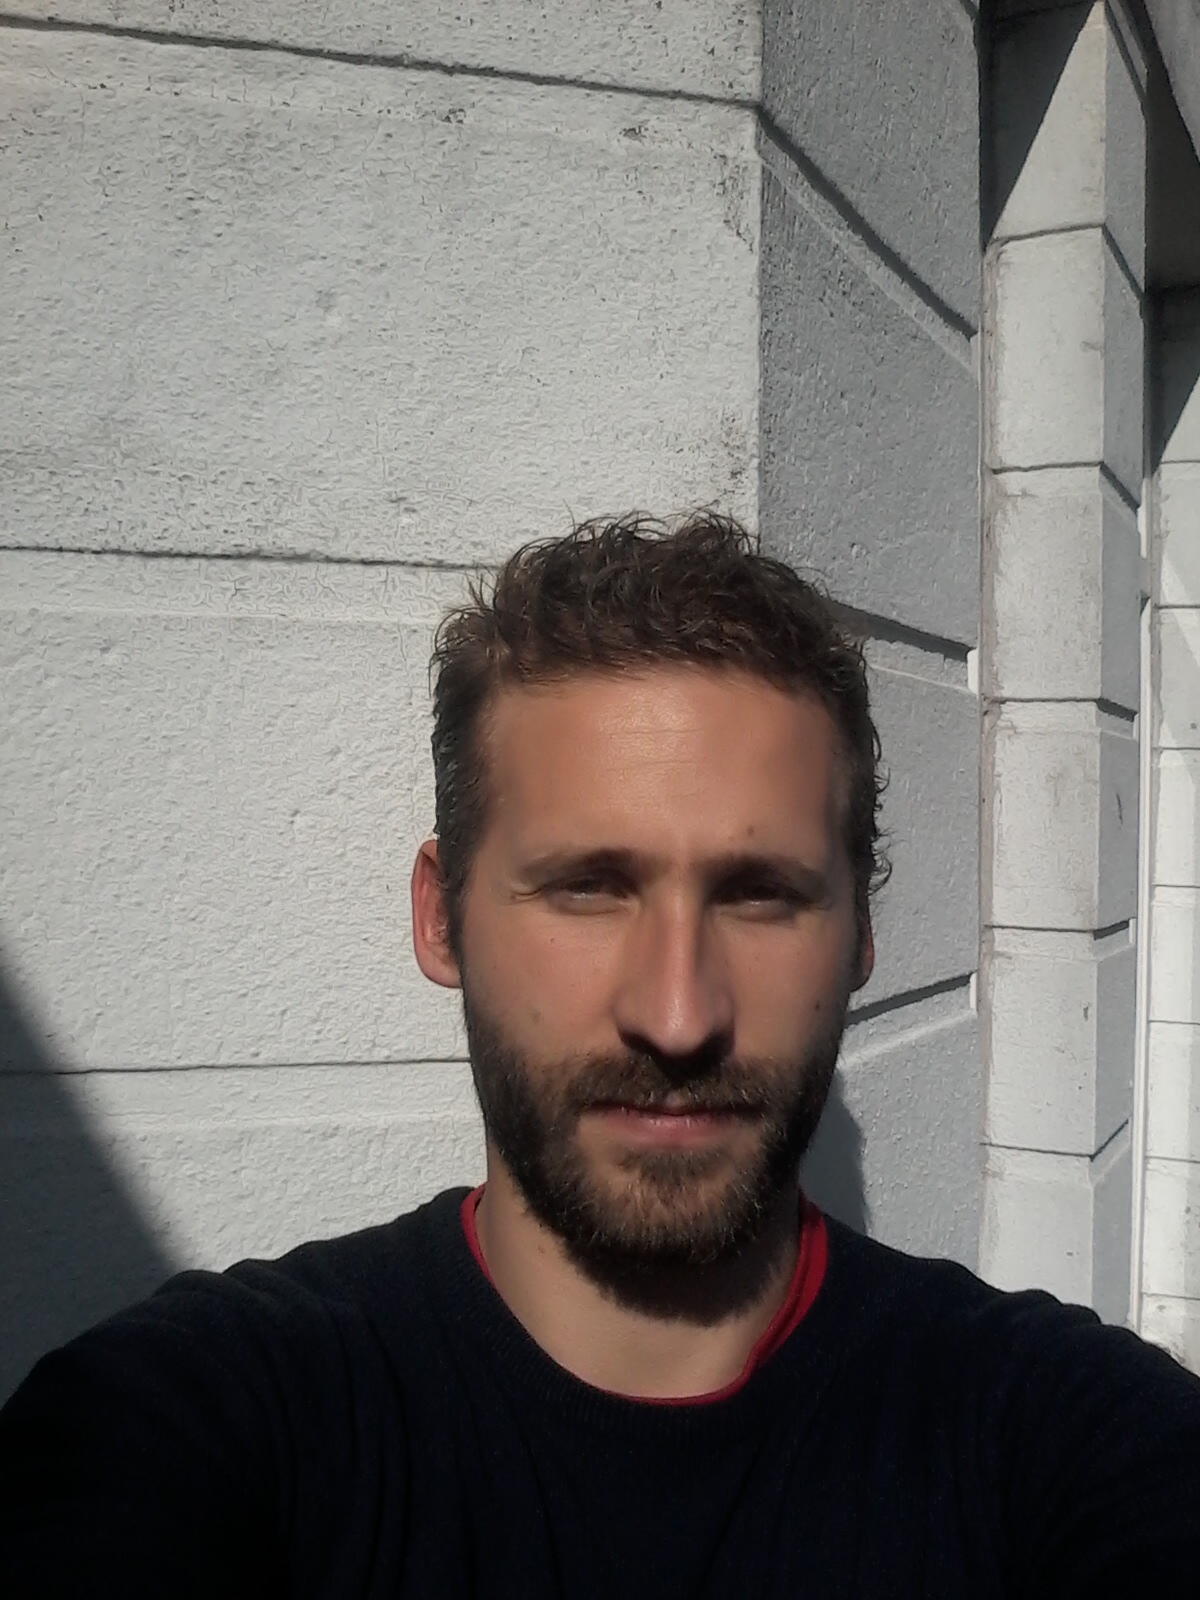 Jordan Allard